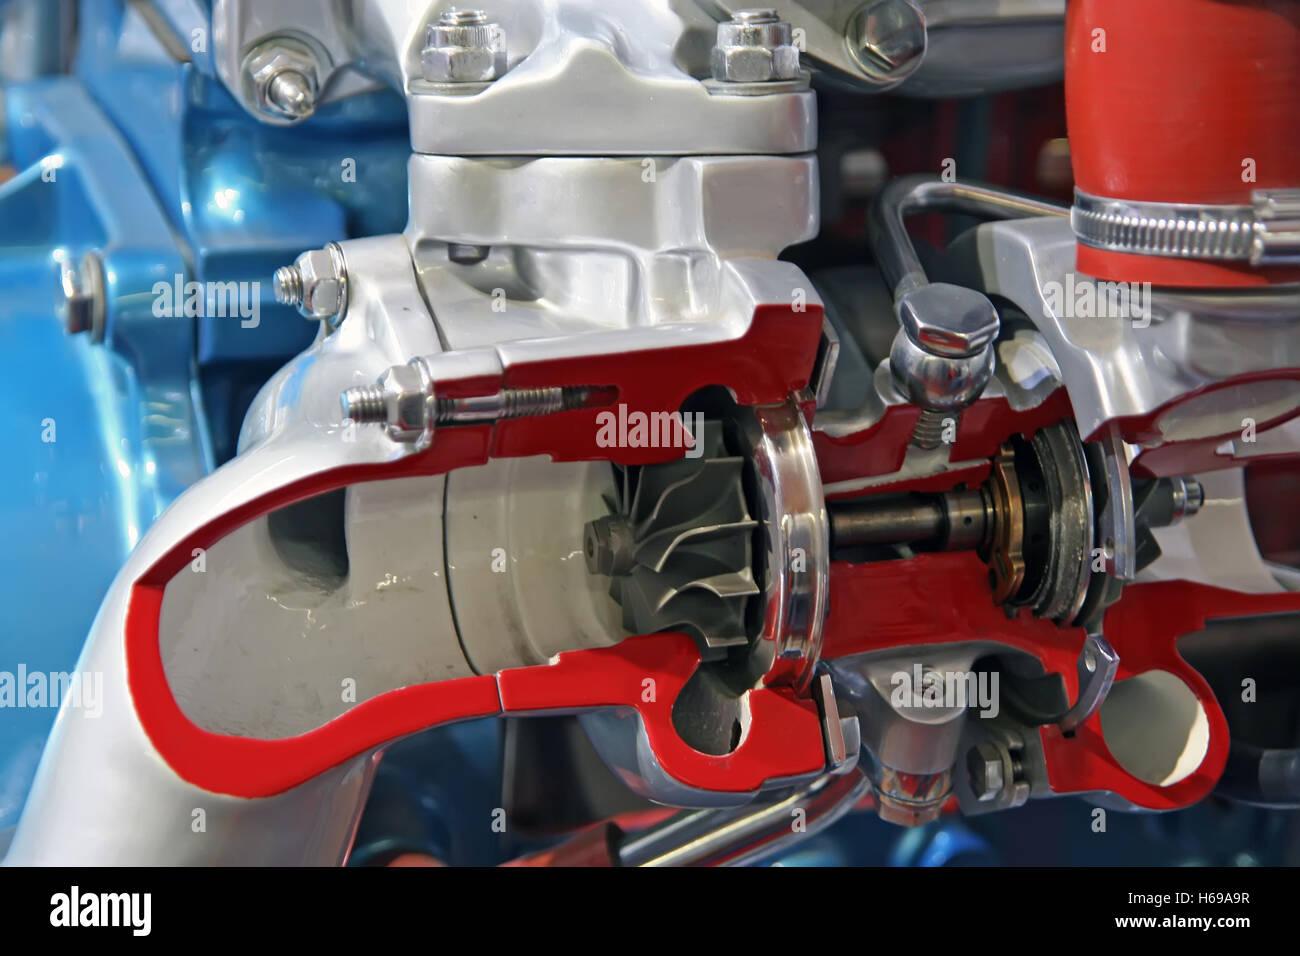 Automobile gearbox part. Car gearbox part. Mechanic part of a automobile. - Stock Image